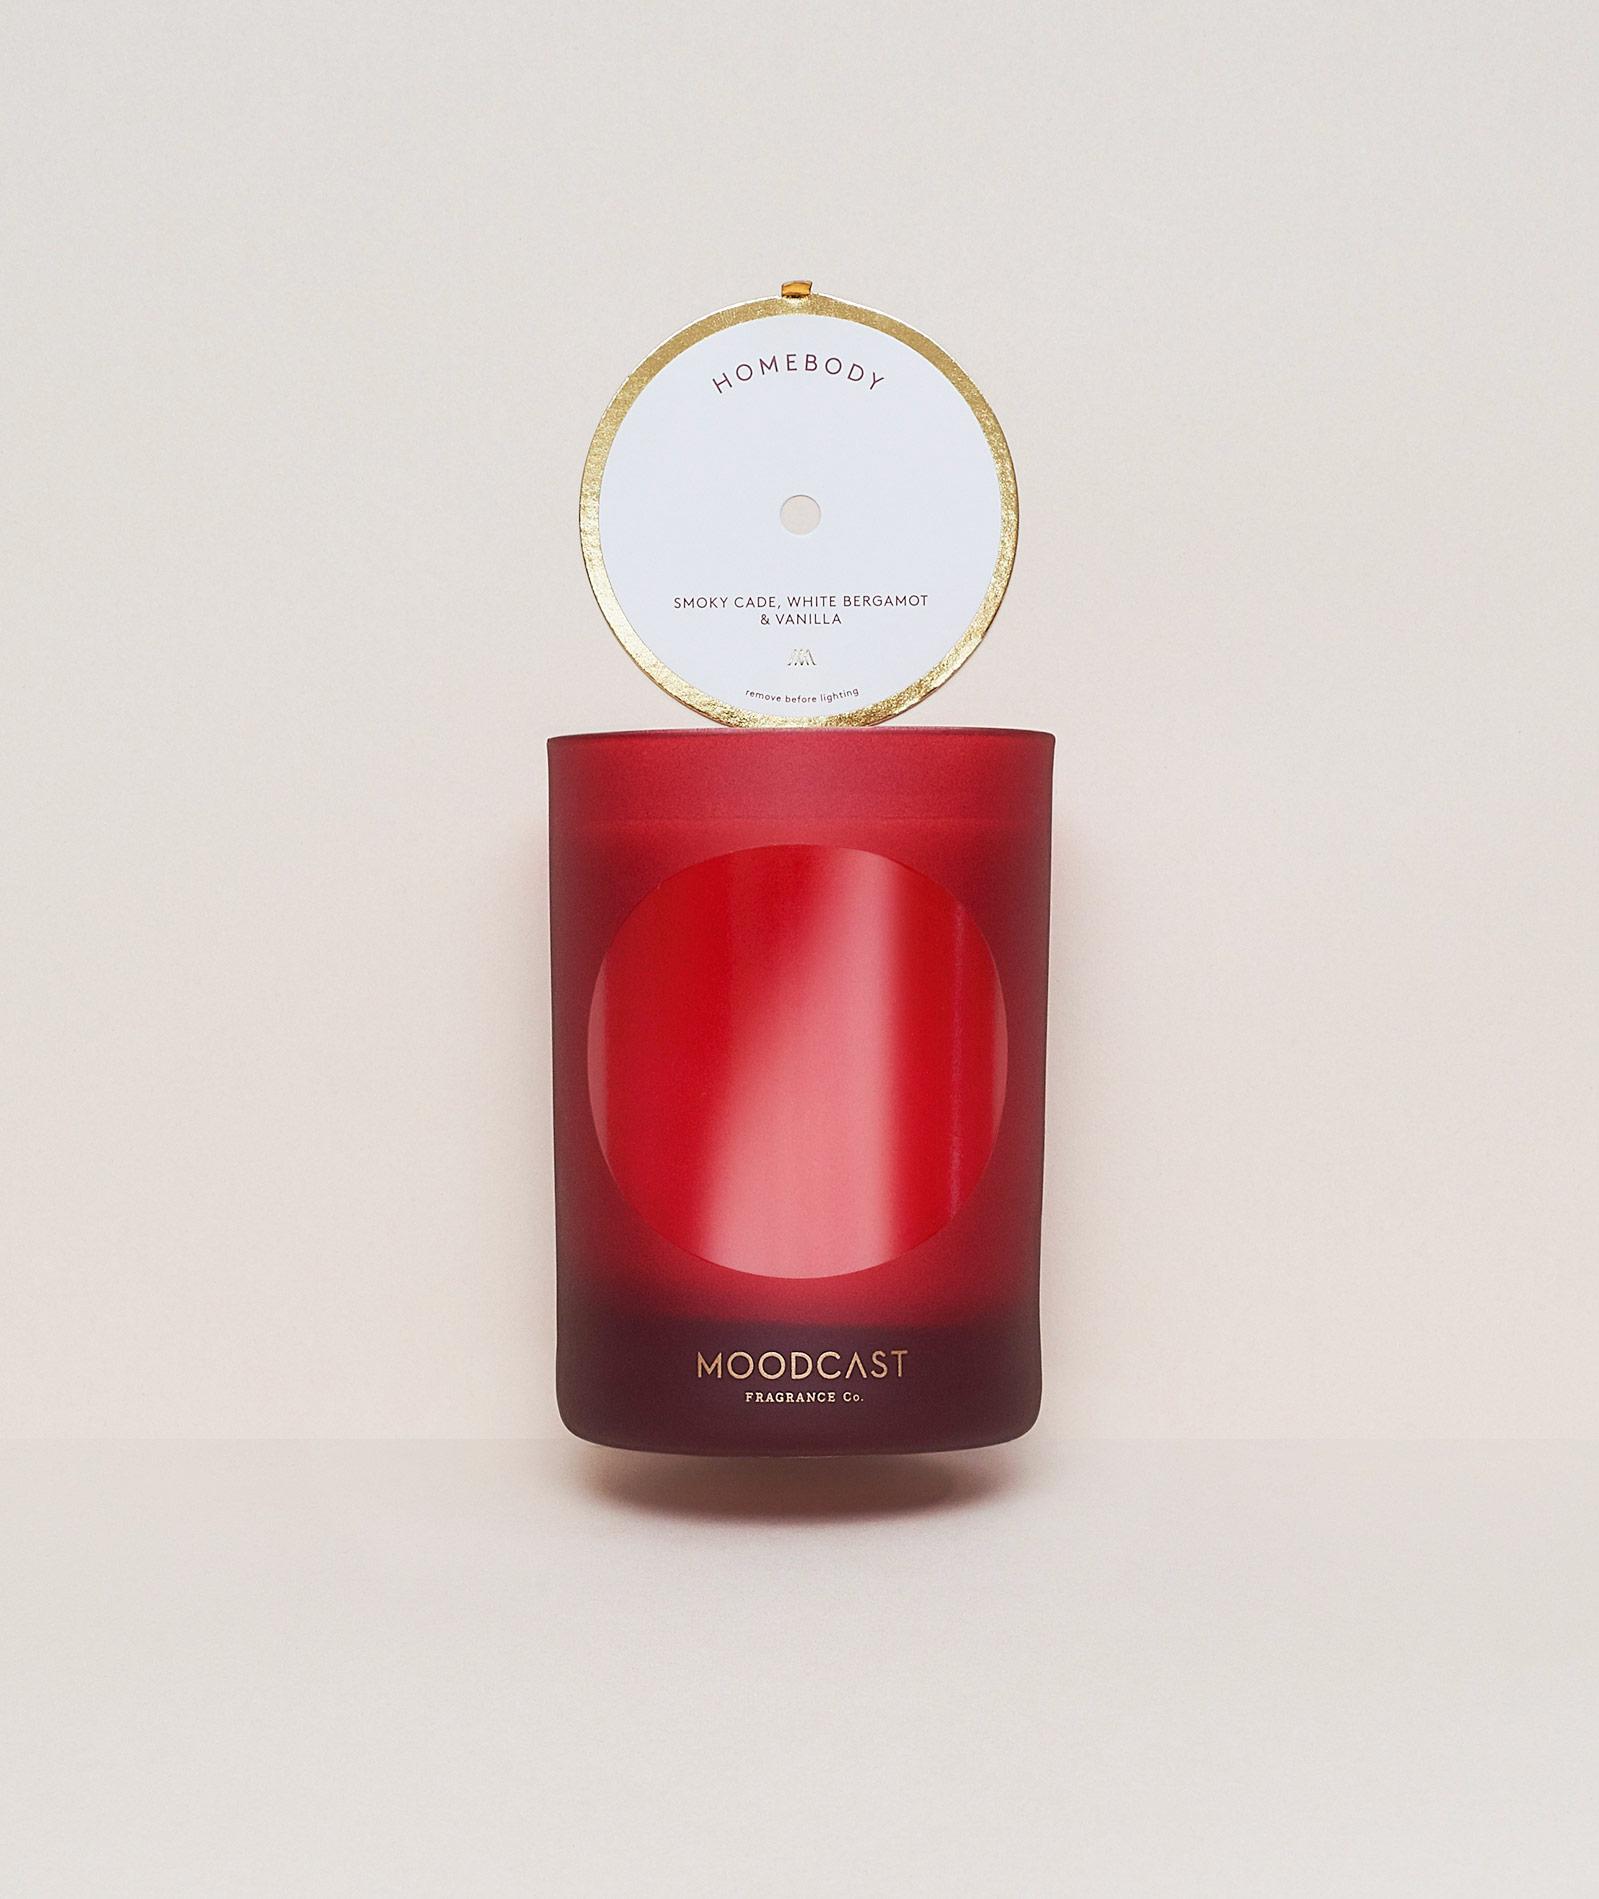 Moodcast Fragrance Co. perfume  - theycallmefred   ello